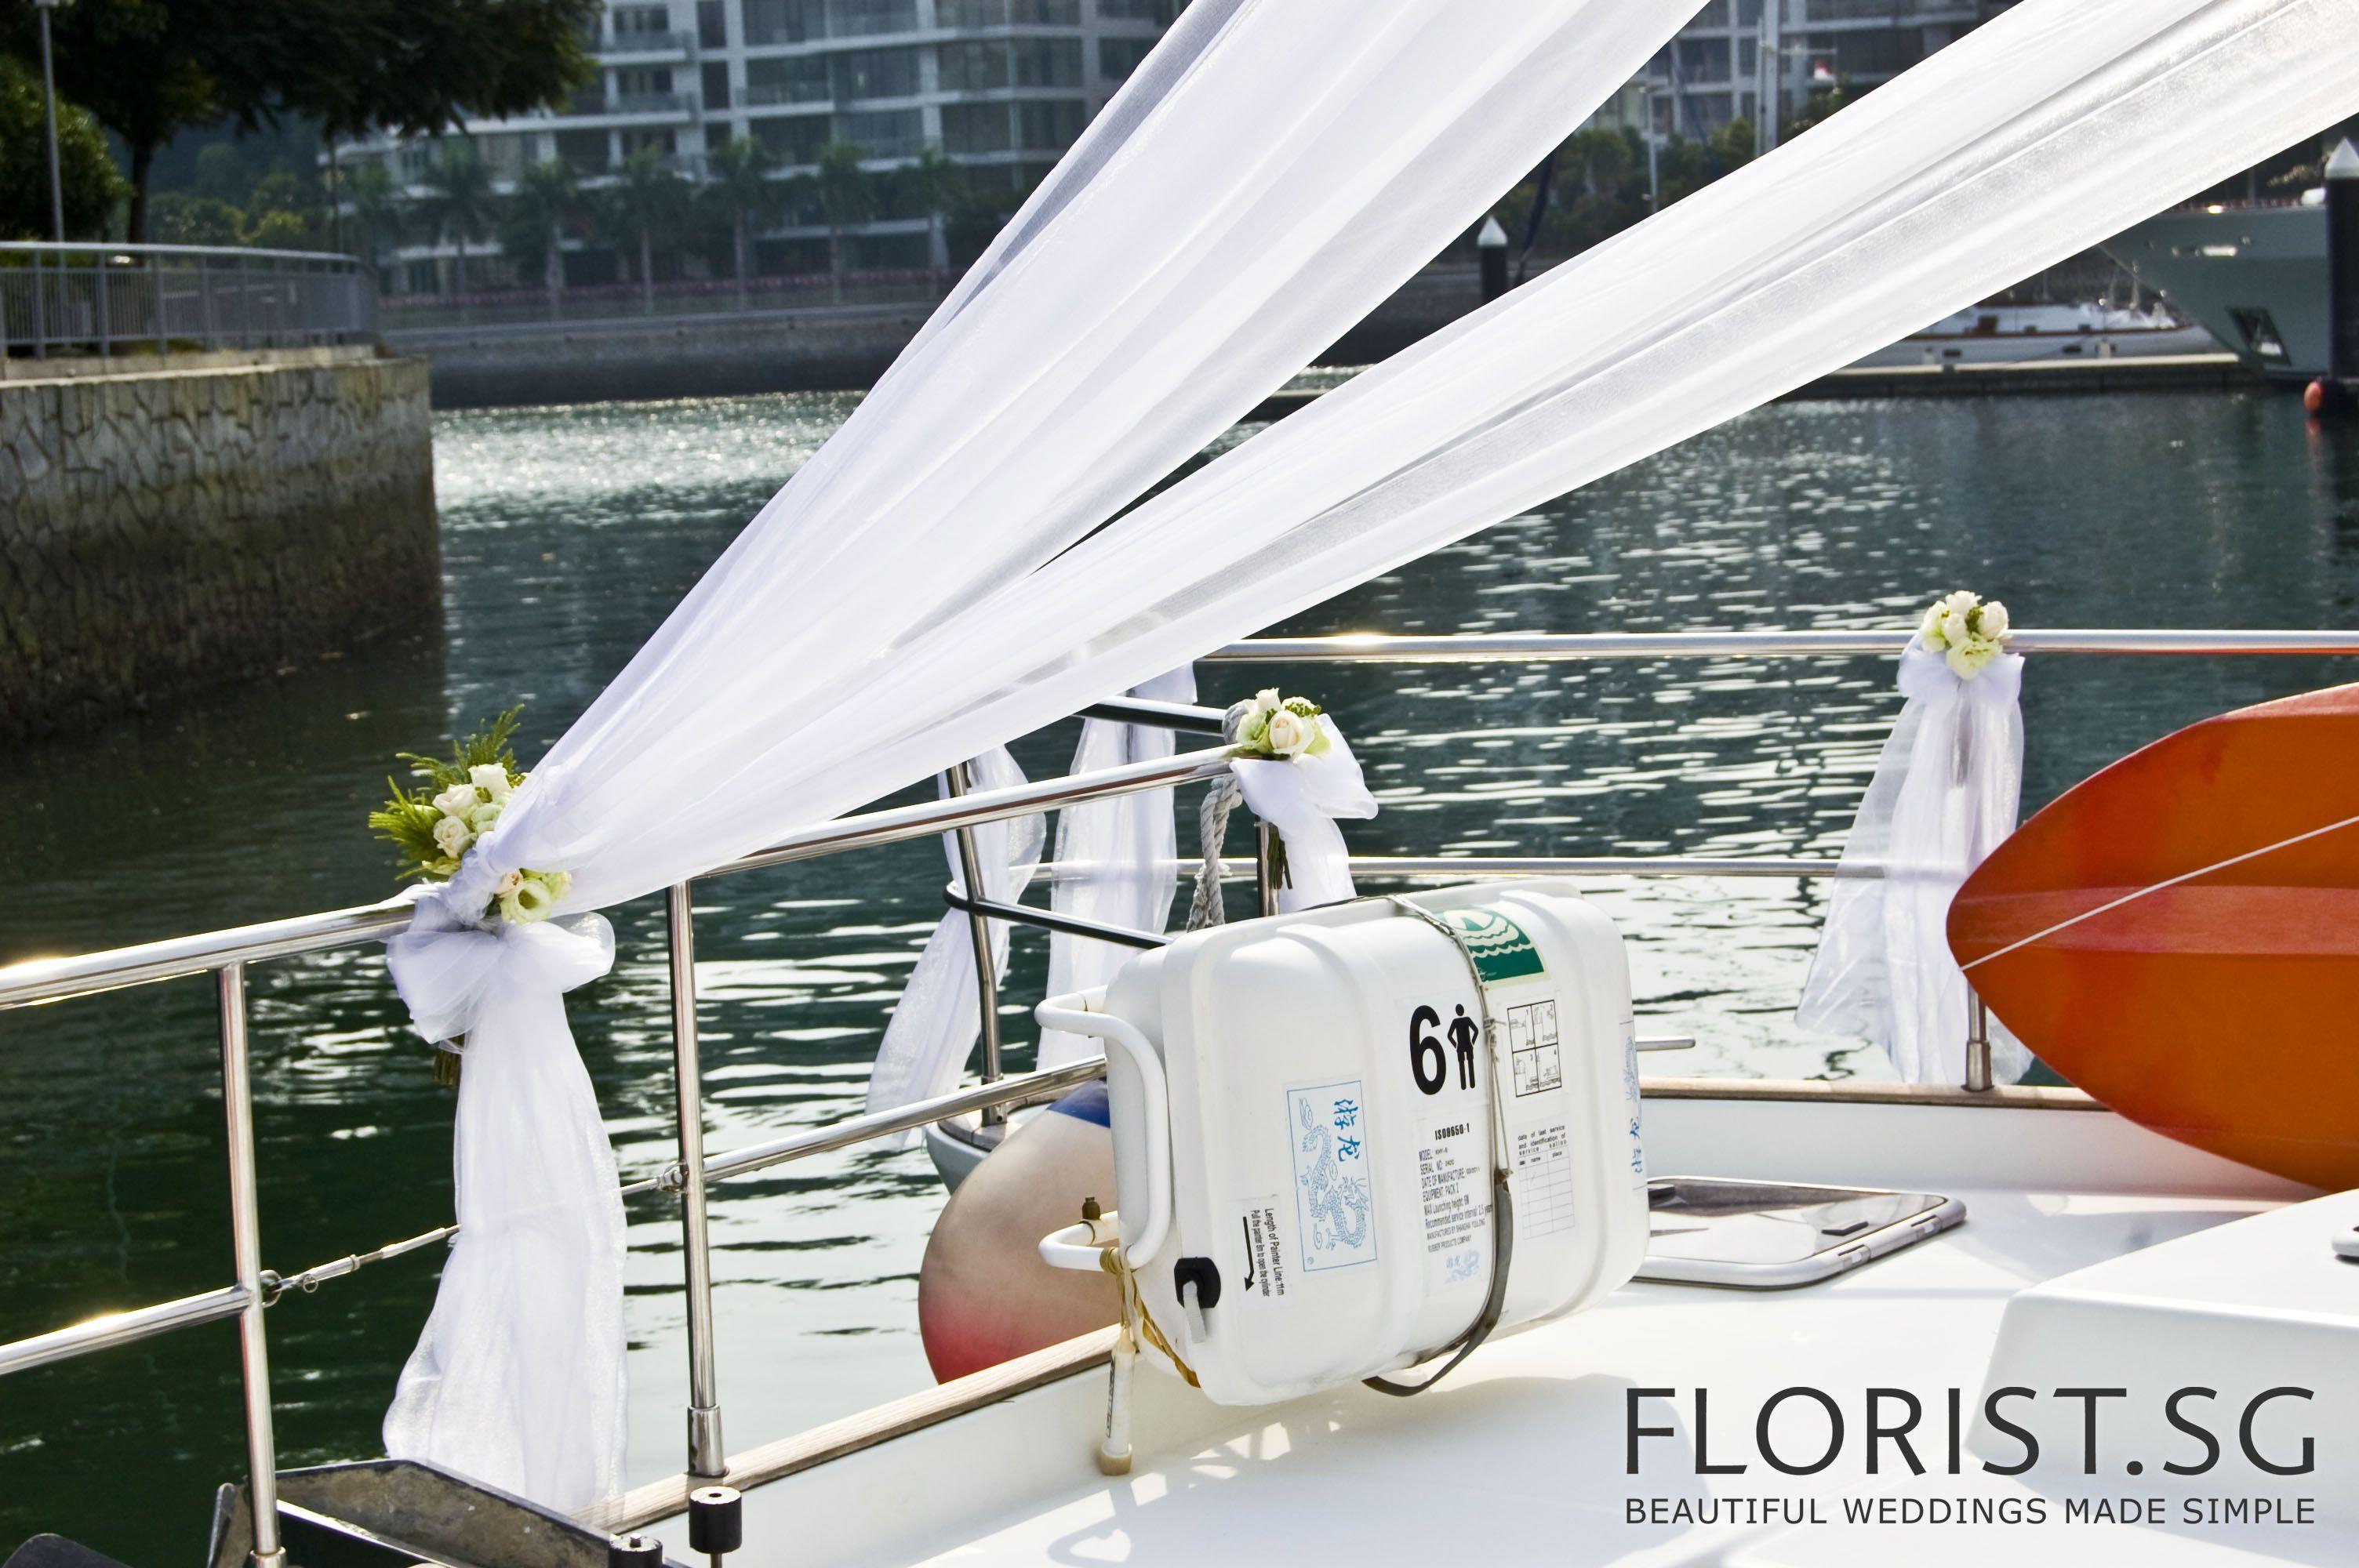 Florist Sg Beautiful Weddings Made Simple Boat Wedding